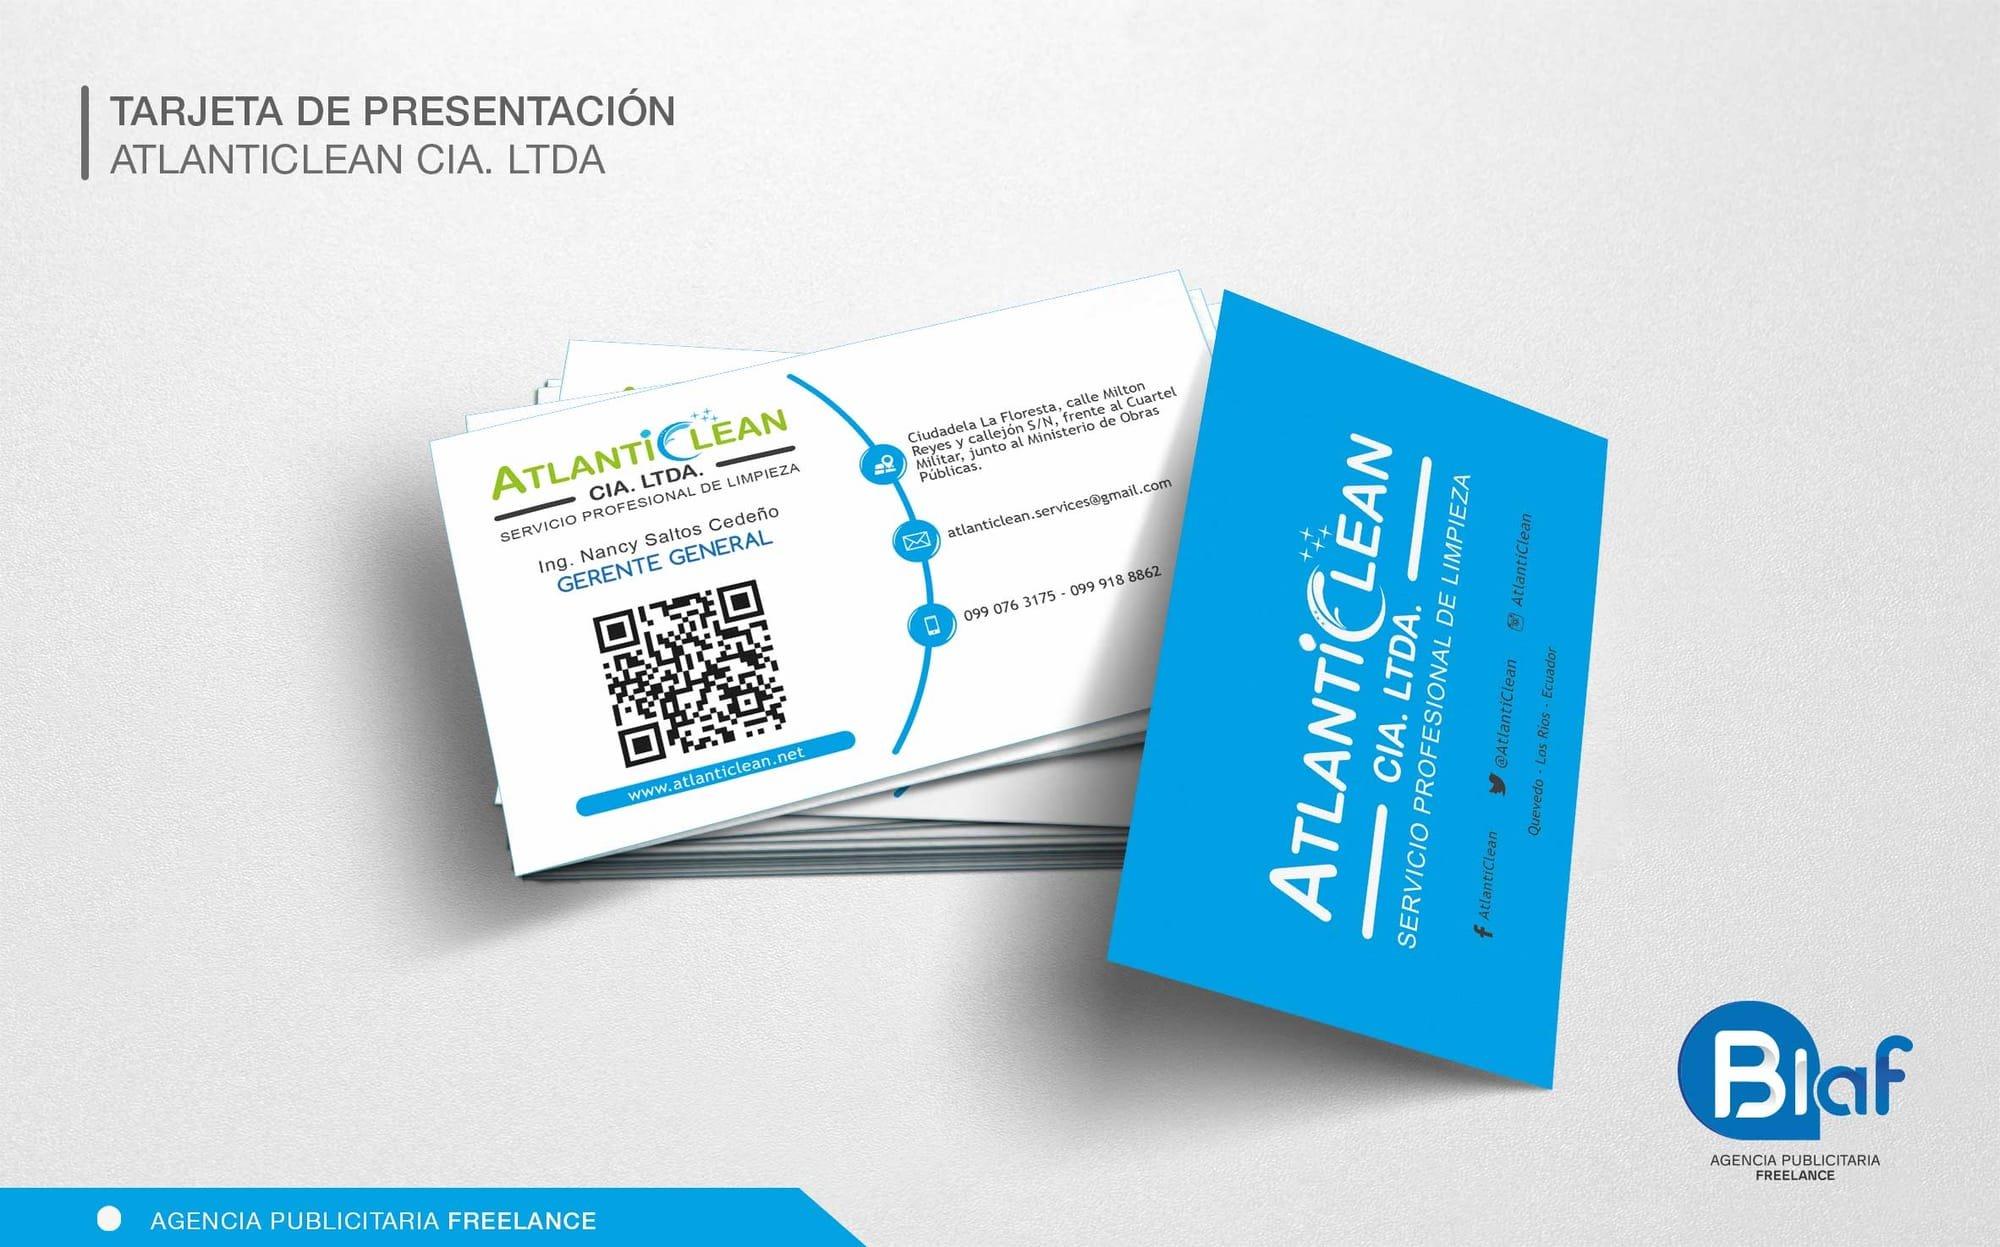 tarjeta de presentación atlanticlean cia ltda blaf studio